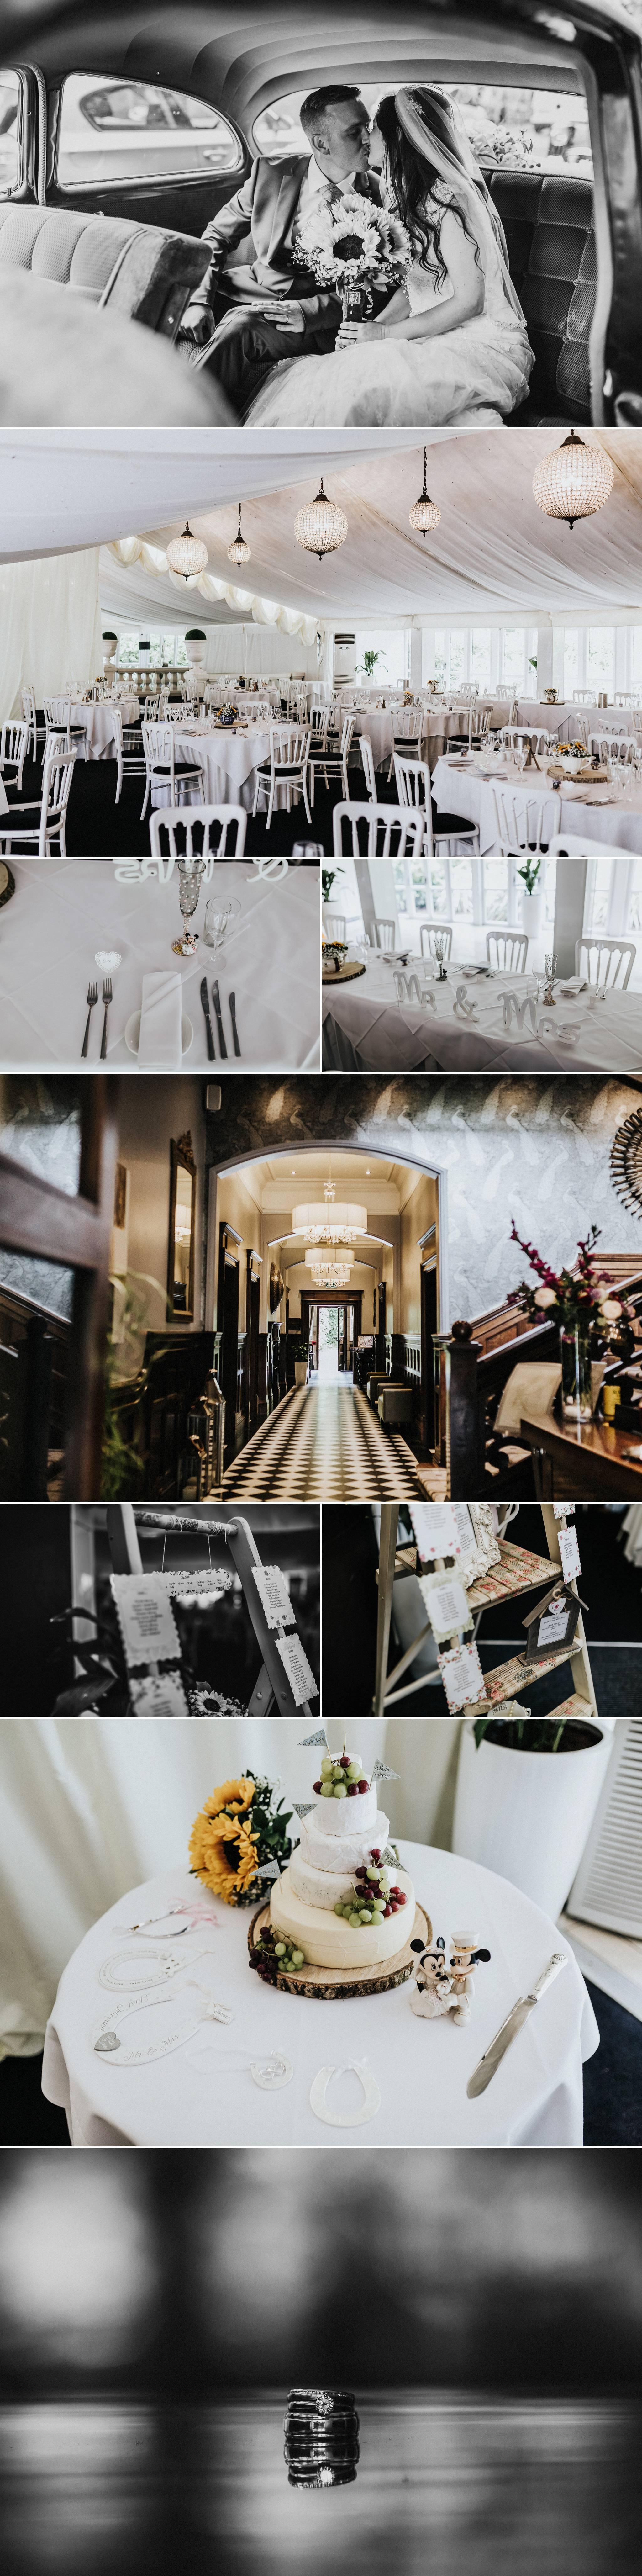 moxhull-hall-wedding-photography 10.jpg